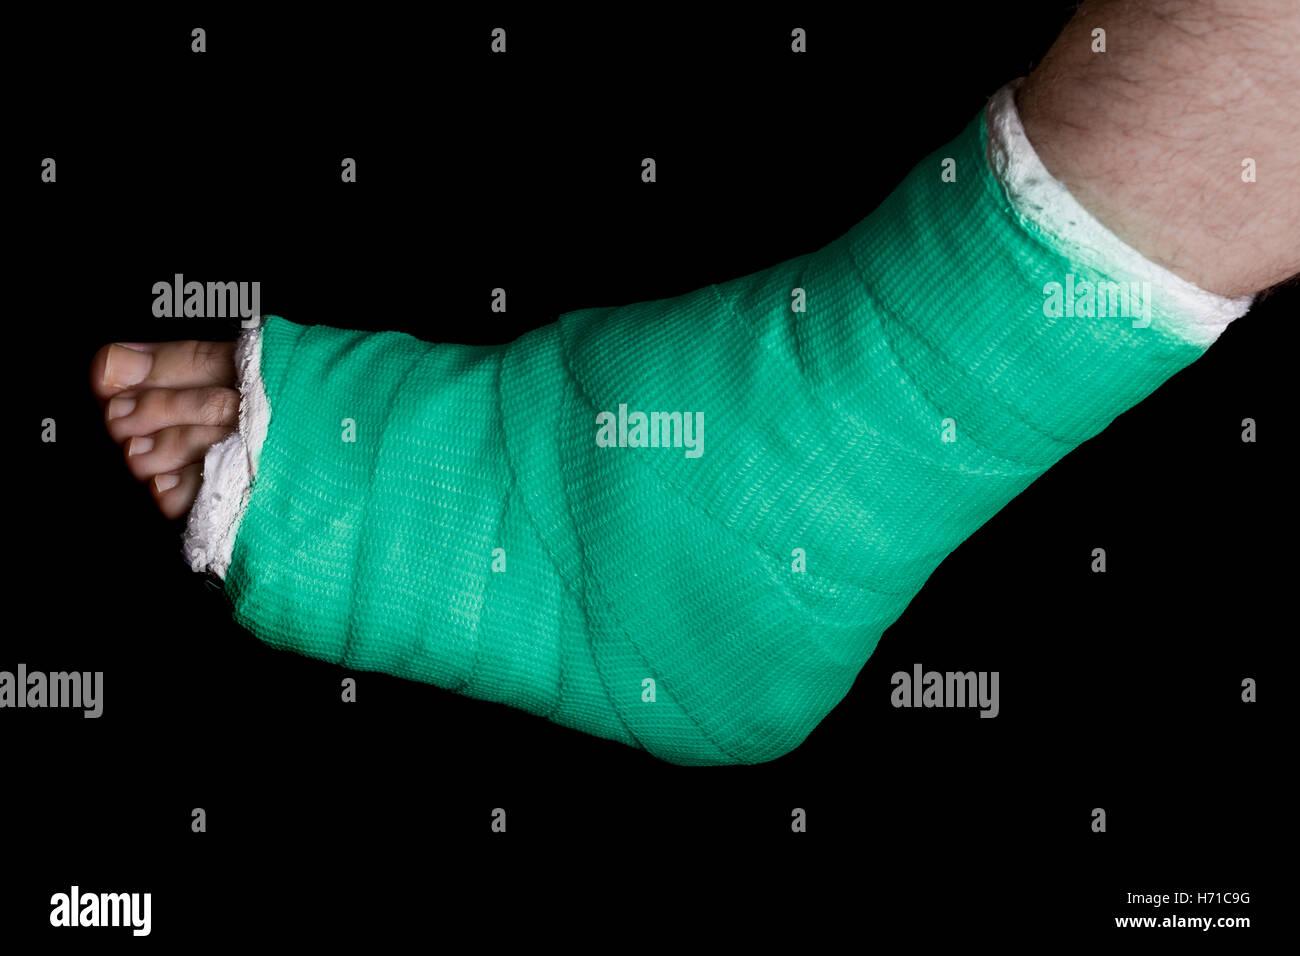 Leg Cast Stock Photos & Leg Cast Stock Images - Alamy